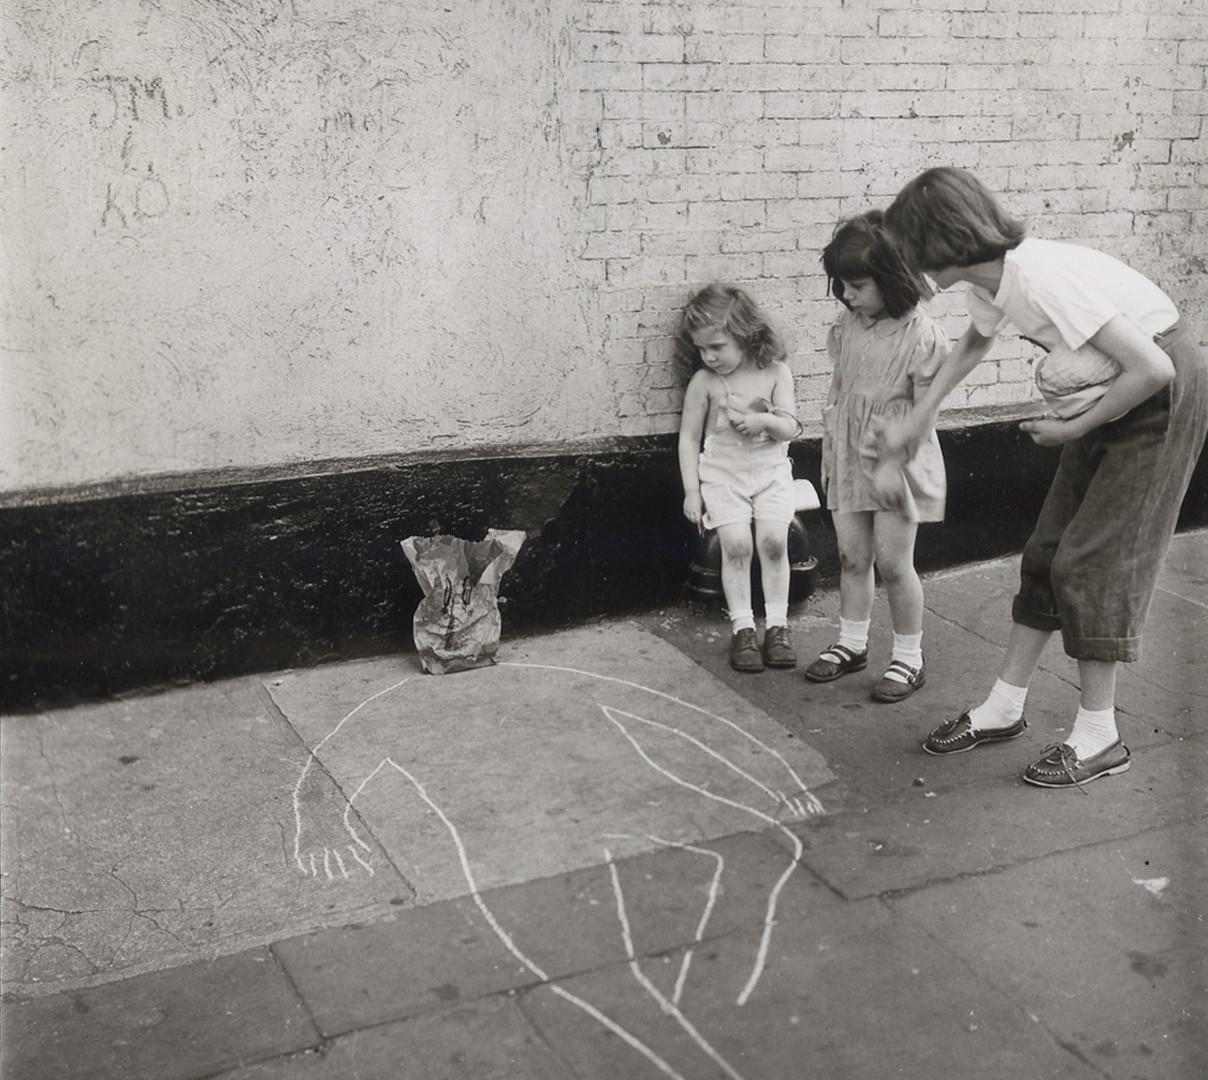 Saul Steinberg, Untitled, June 12, 1950